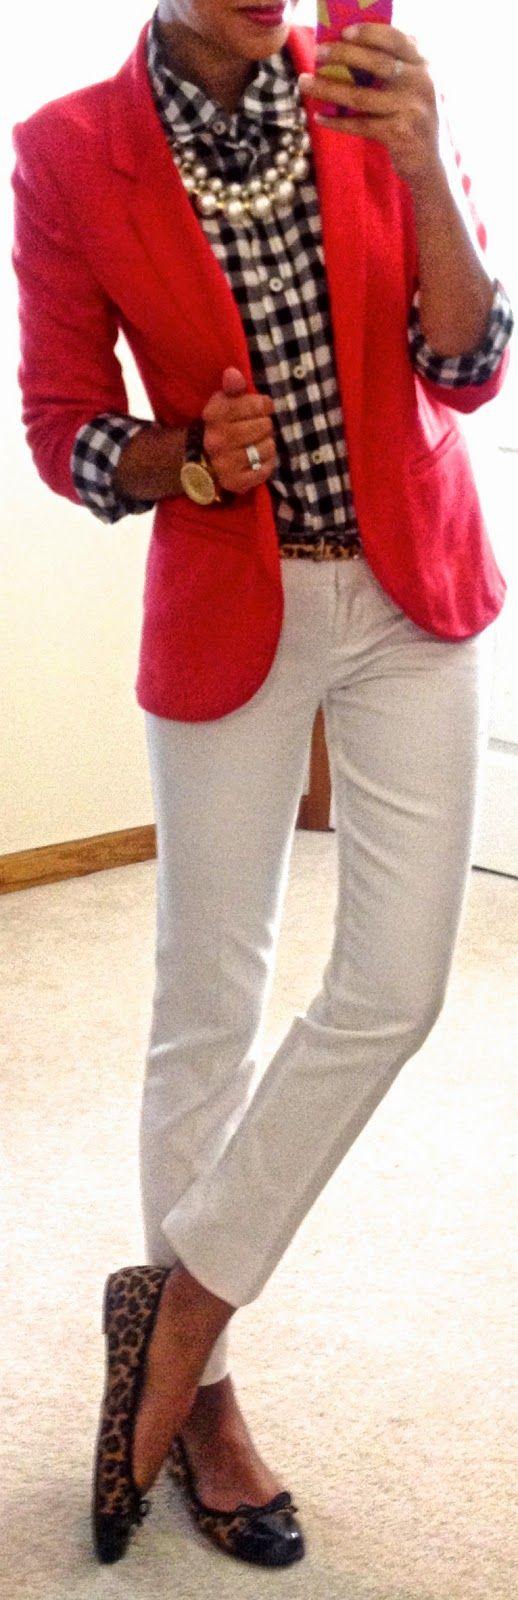 Gingham shirt, red blazer, leopard print accessories.